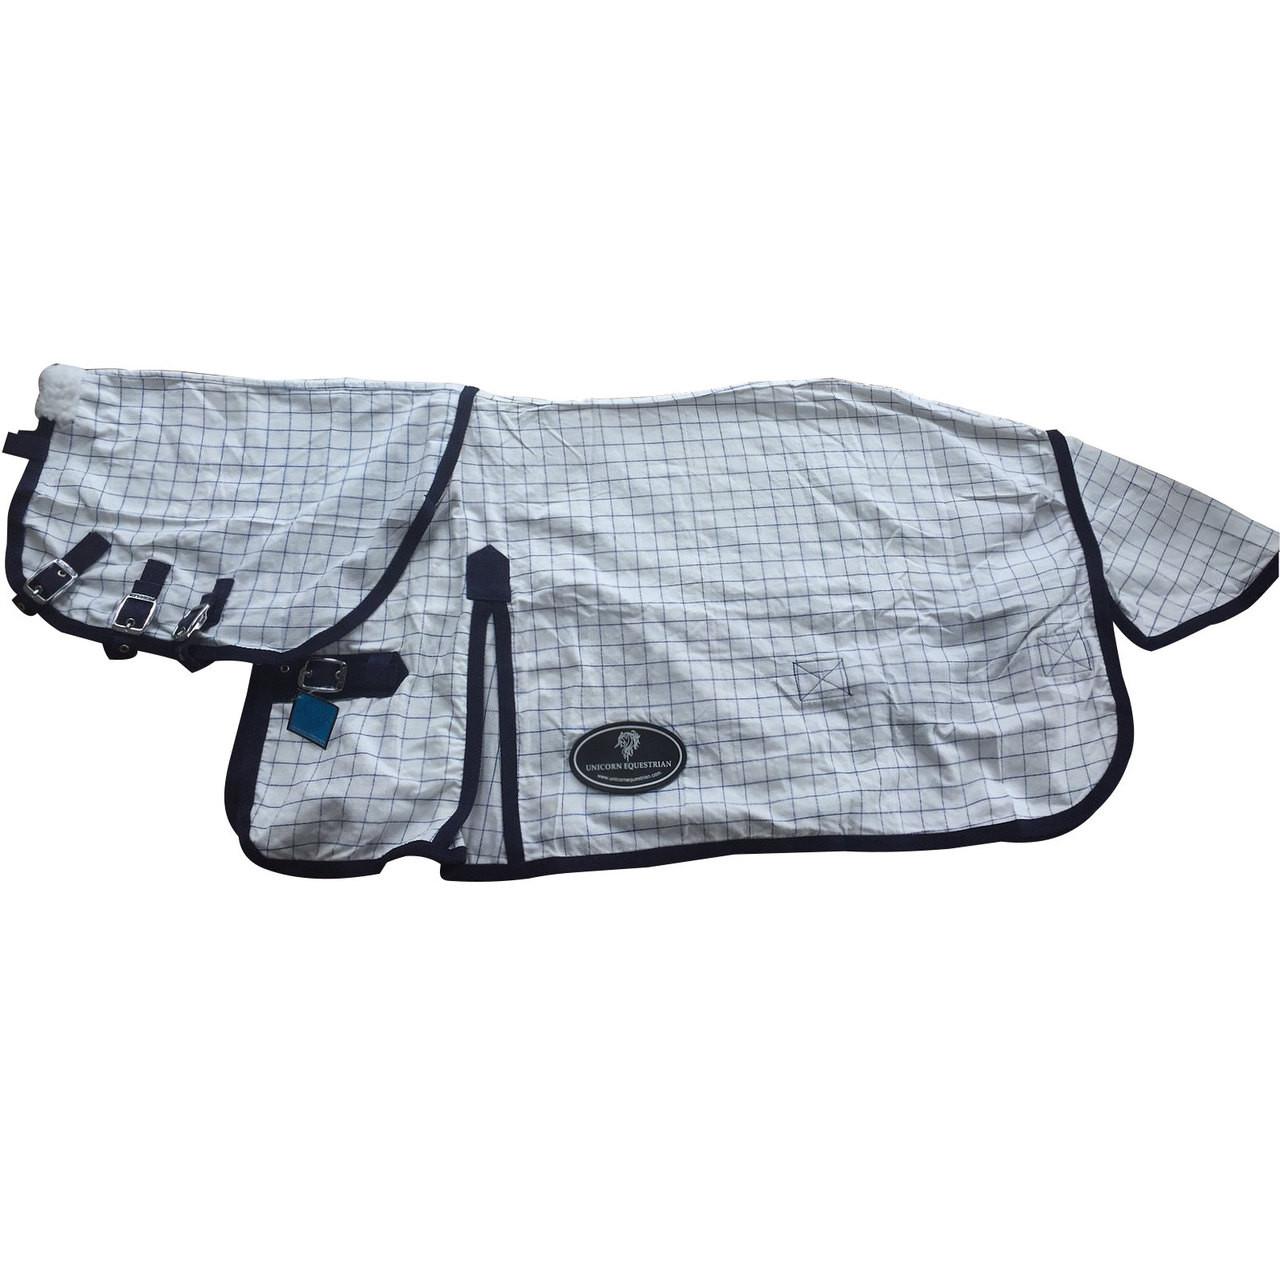 Miniature Polycotton Combo Rugs